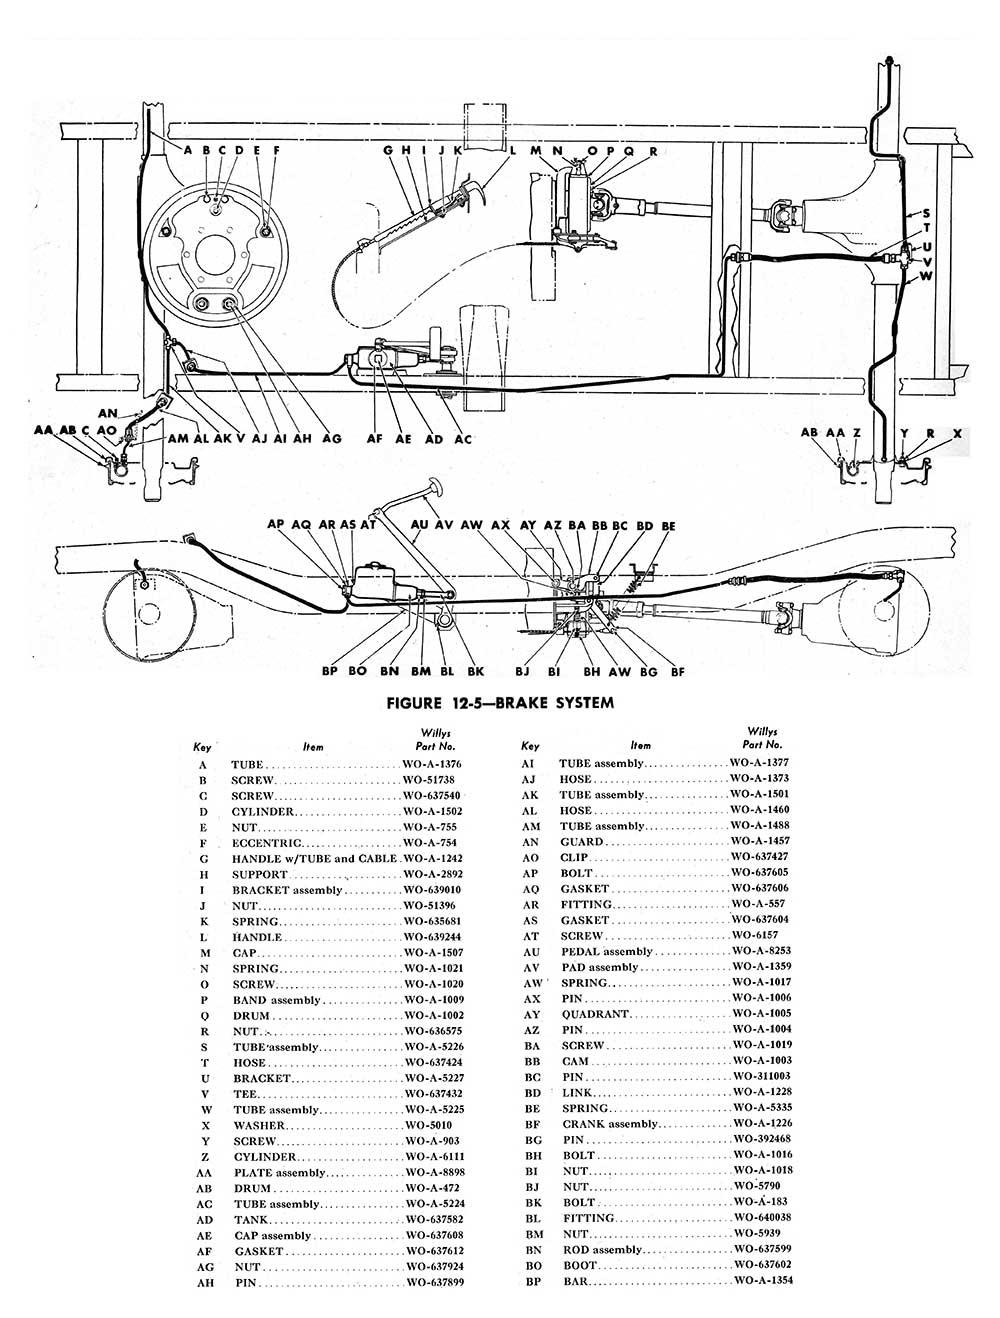 medium resolution of willys jeepster wiring diagram imageresizertool com residential electrical wiring diagrams automotive wiring diagrams